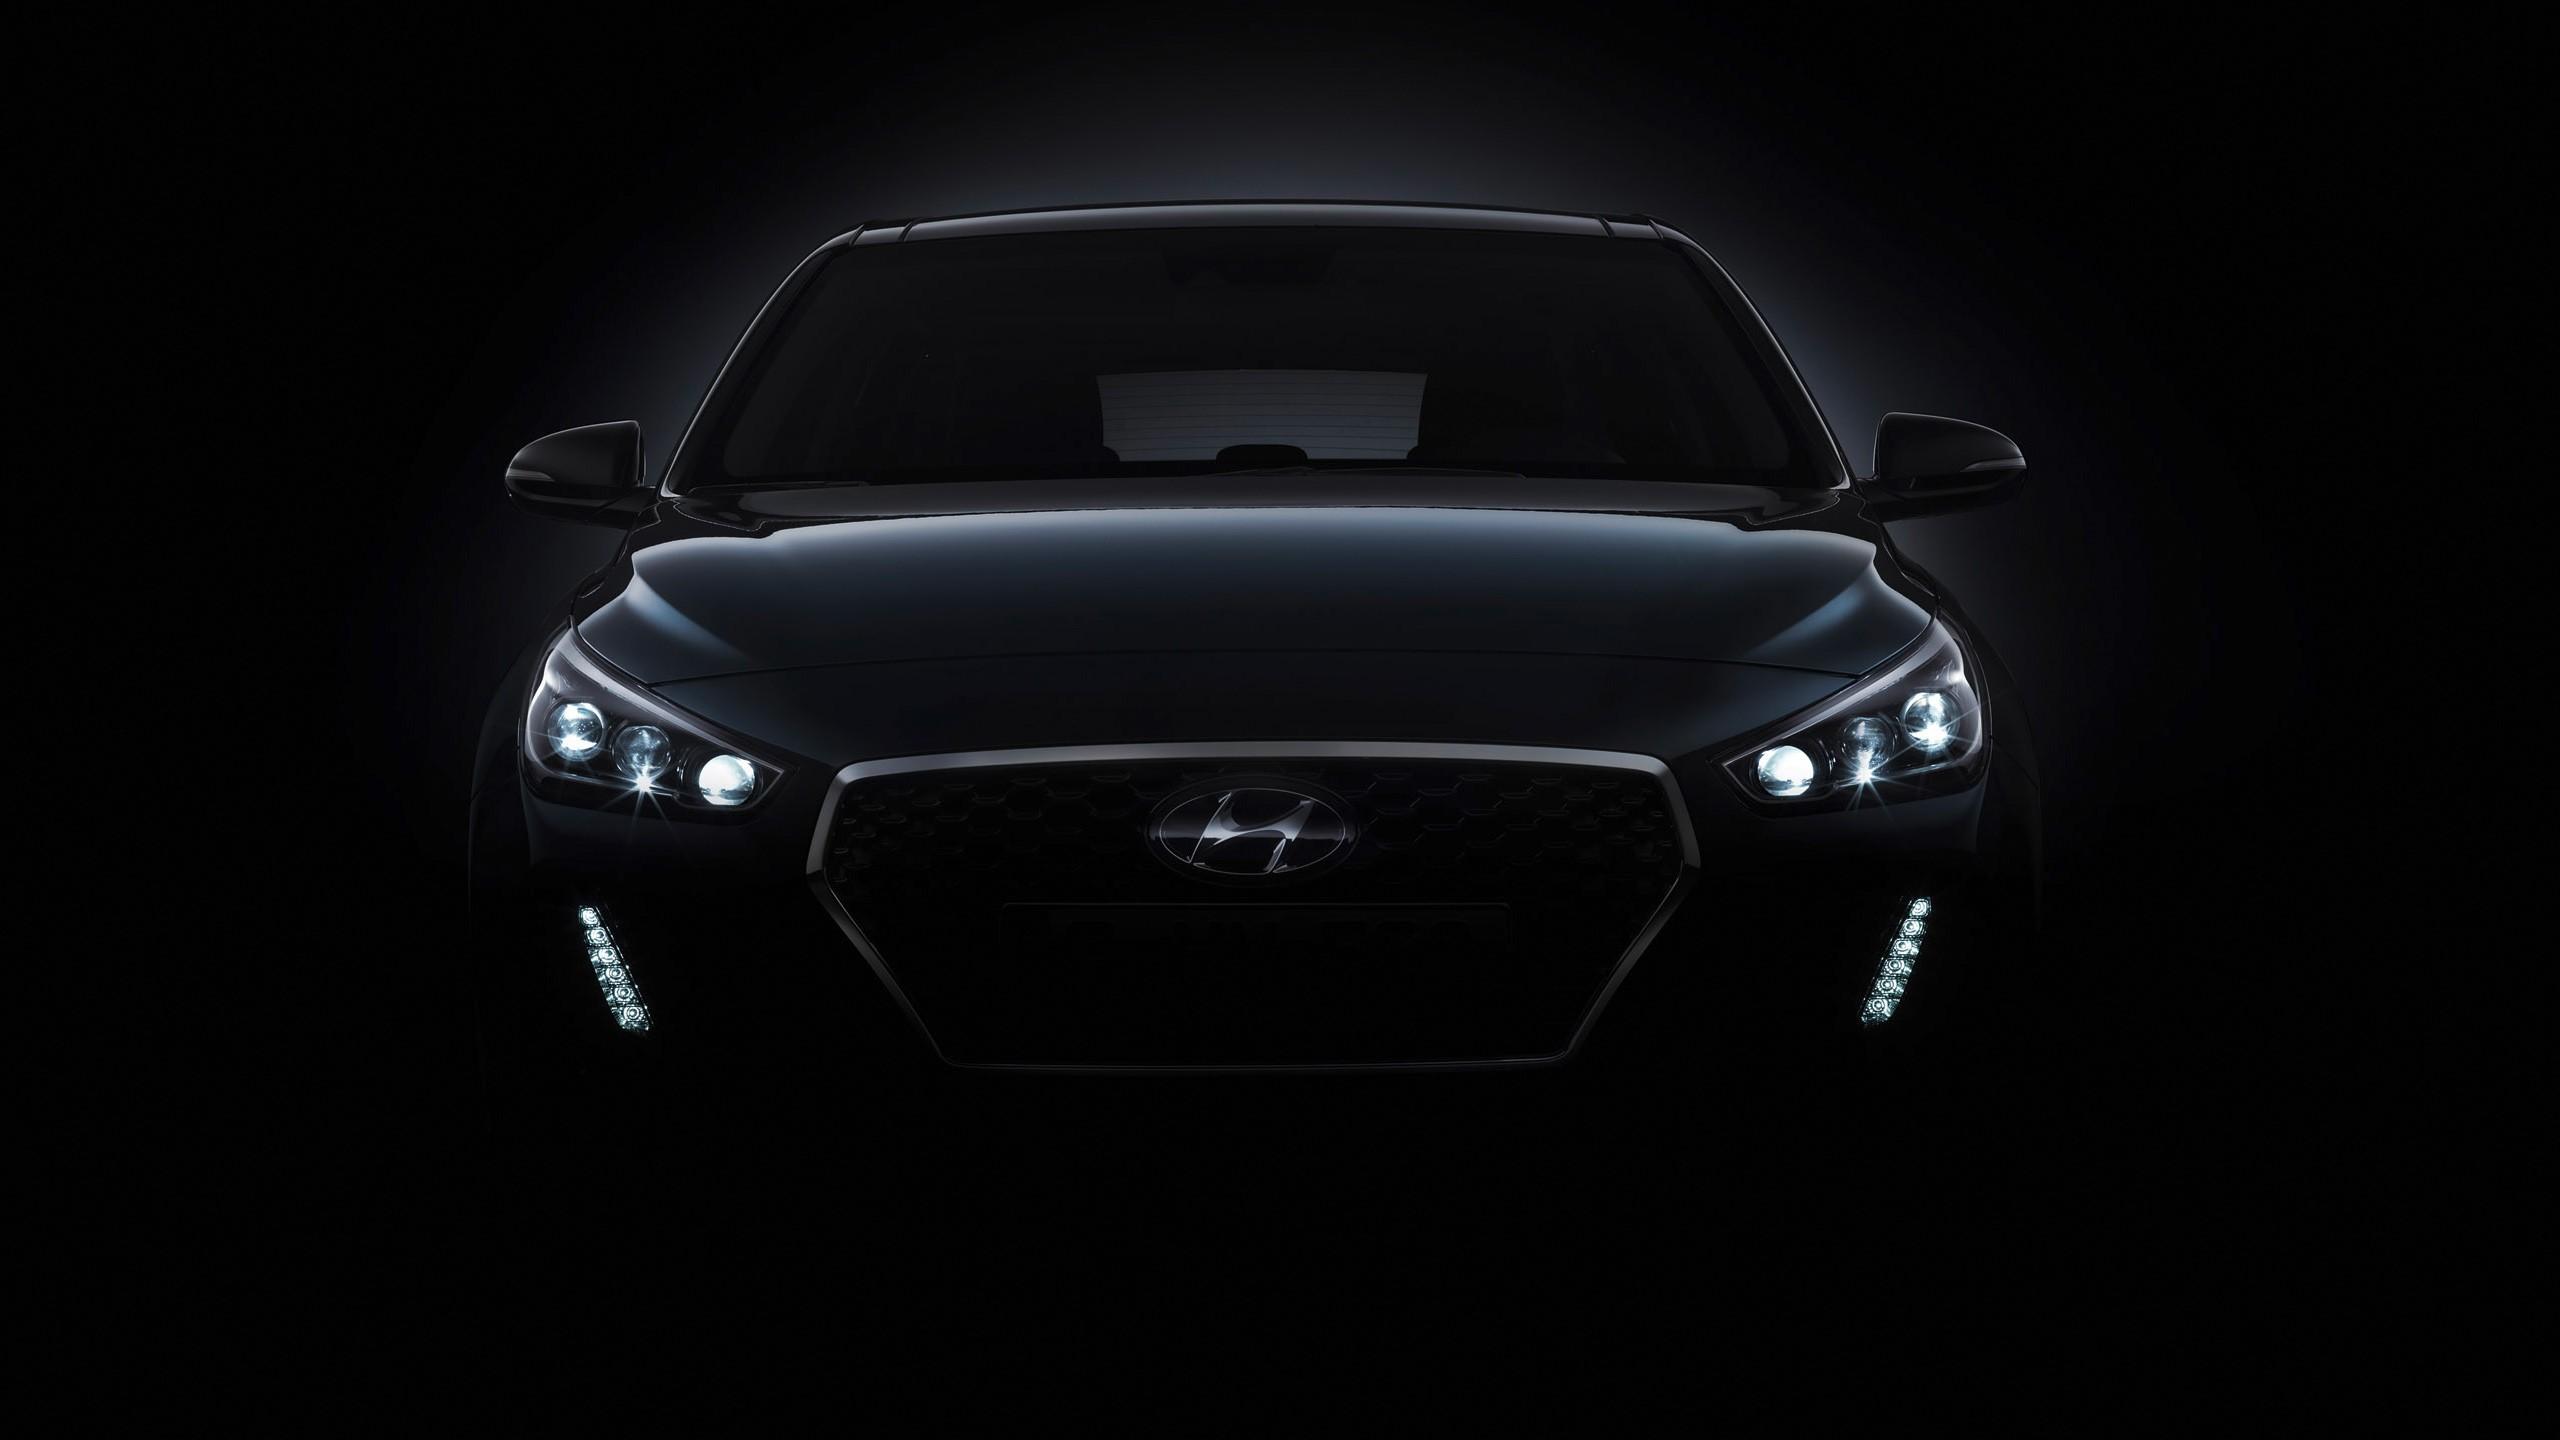 2017 Hyundai i30 Teaser Wallpaper   HD Car Wallpapers   ID 6882